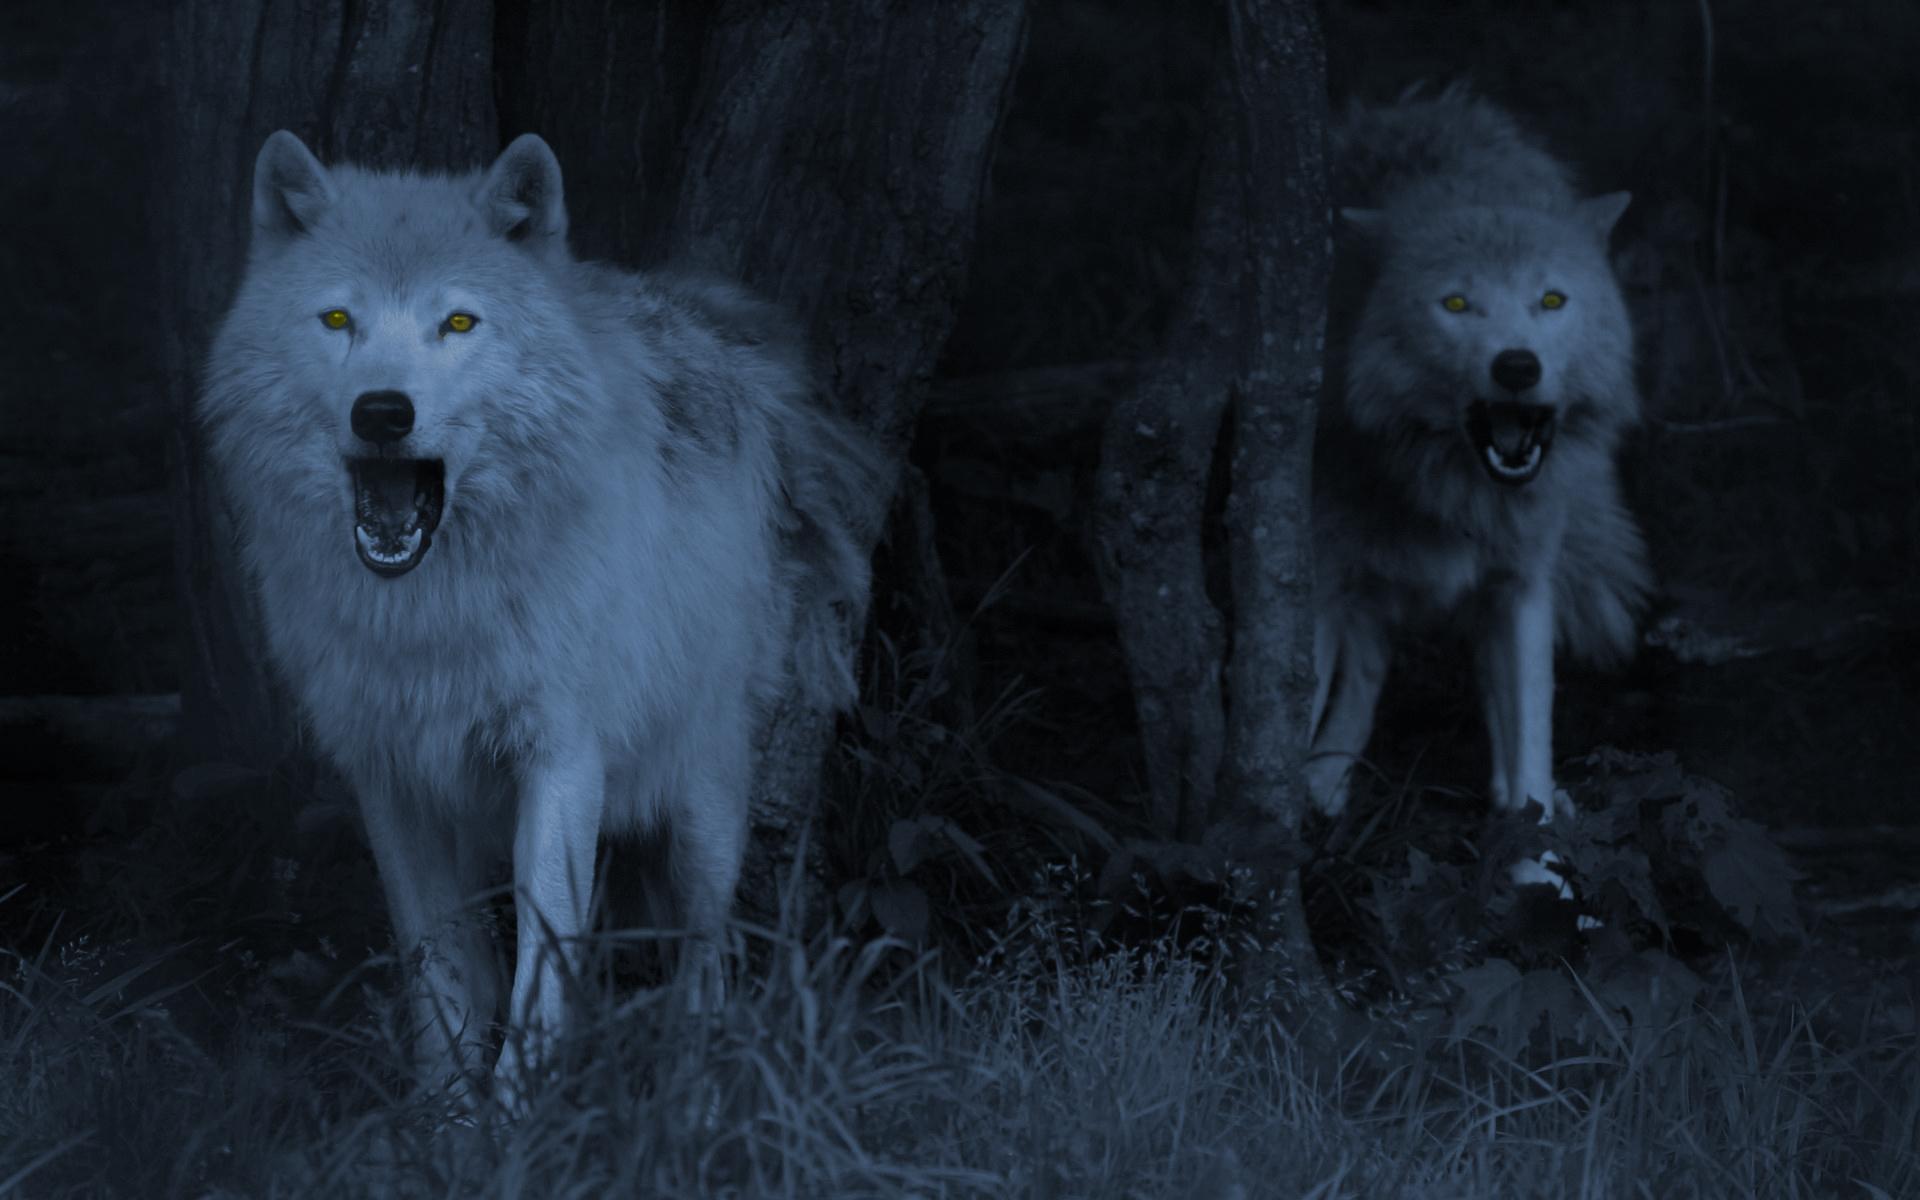 wolf computer wallpaper hd - photo #25